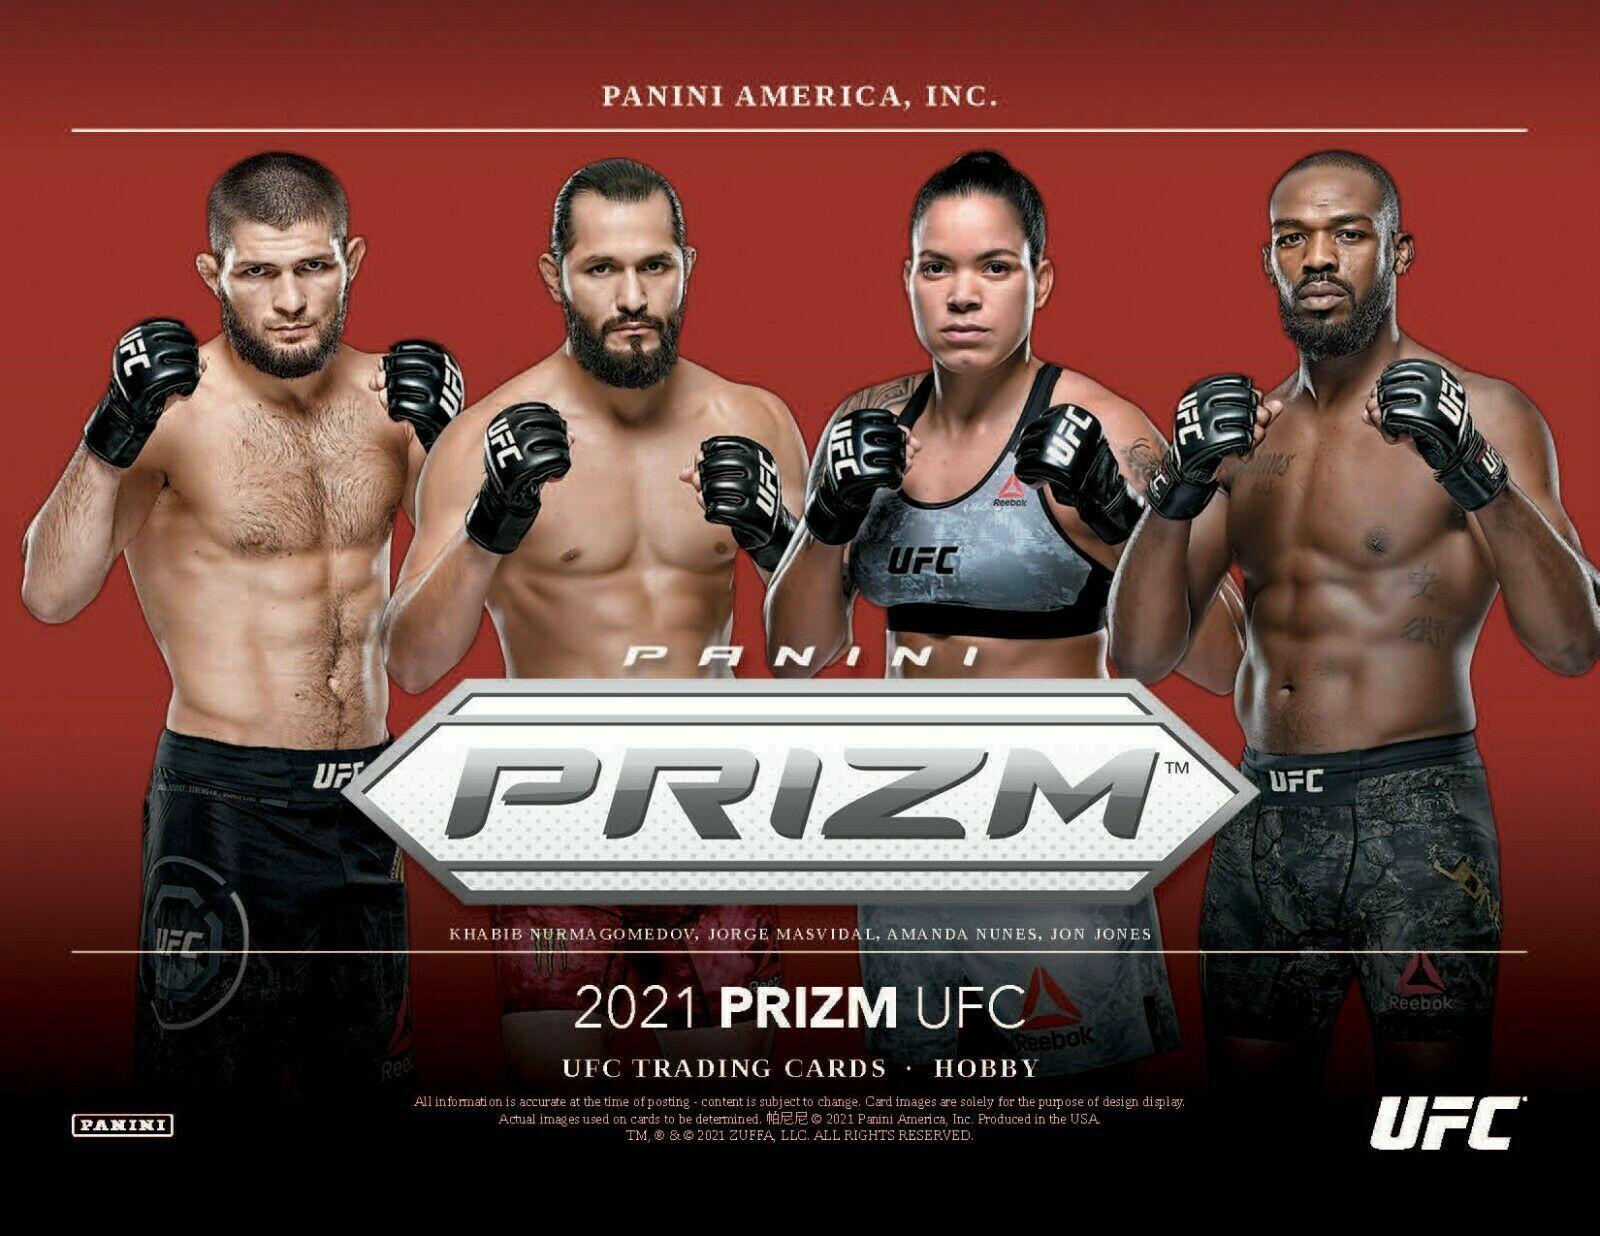 KHABIB NURMAGOMEDOV 2021 PANINI PRIZM UFC 1/3 CASE 4 BOX FIGHTER BREAK 2 - $275.00